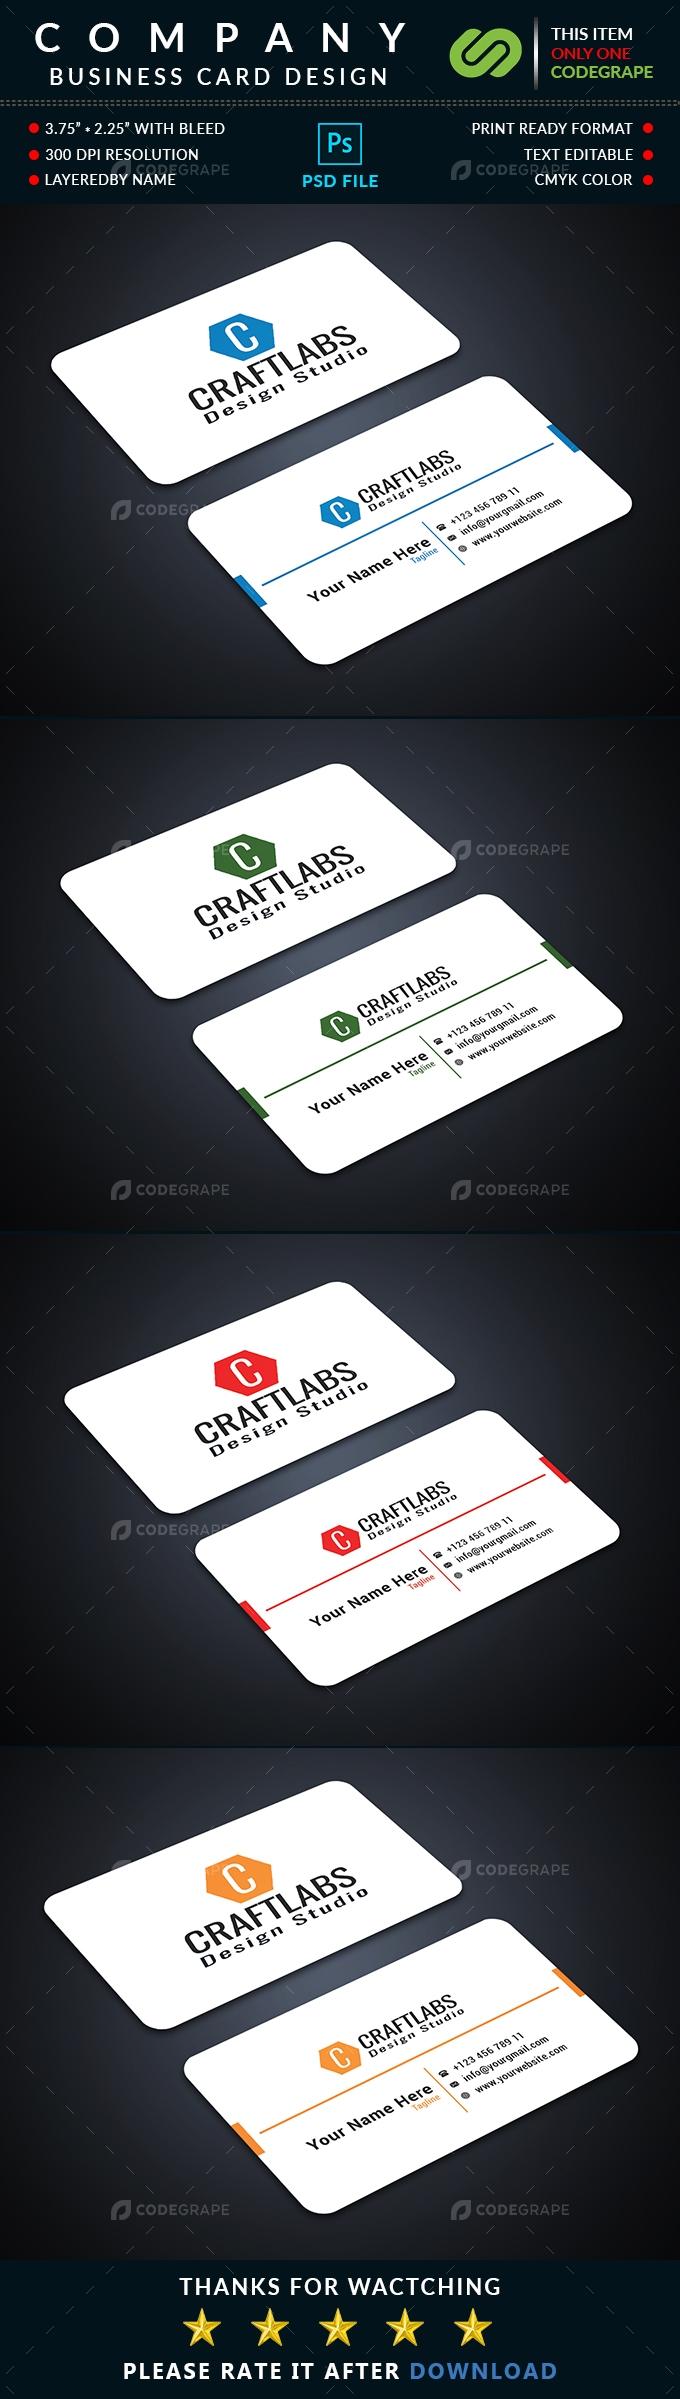 Company Business Card